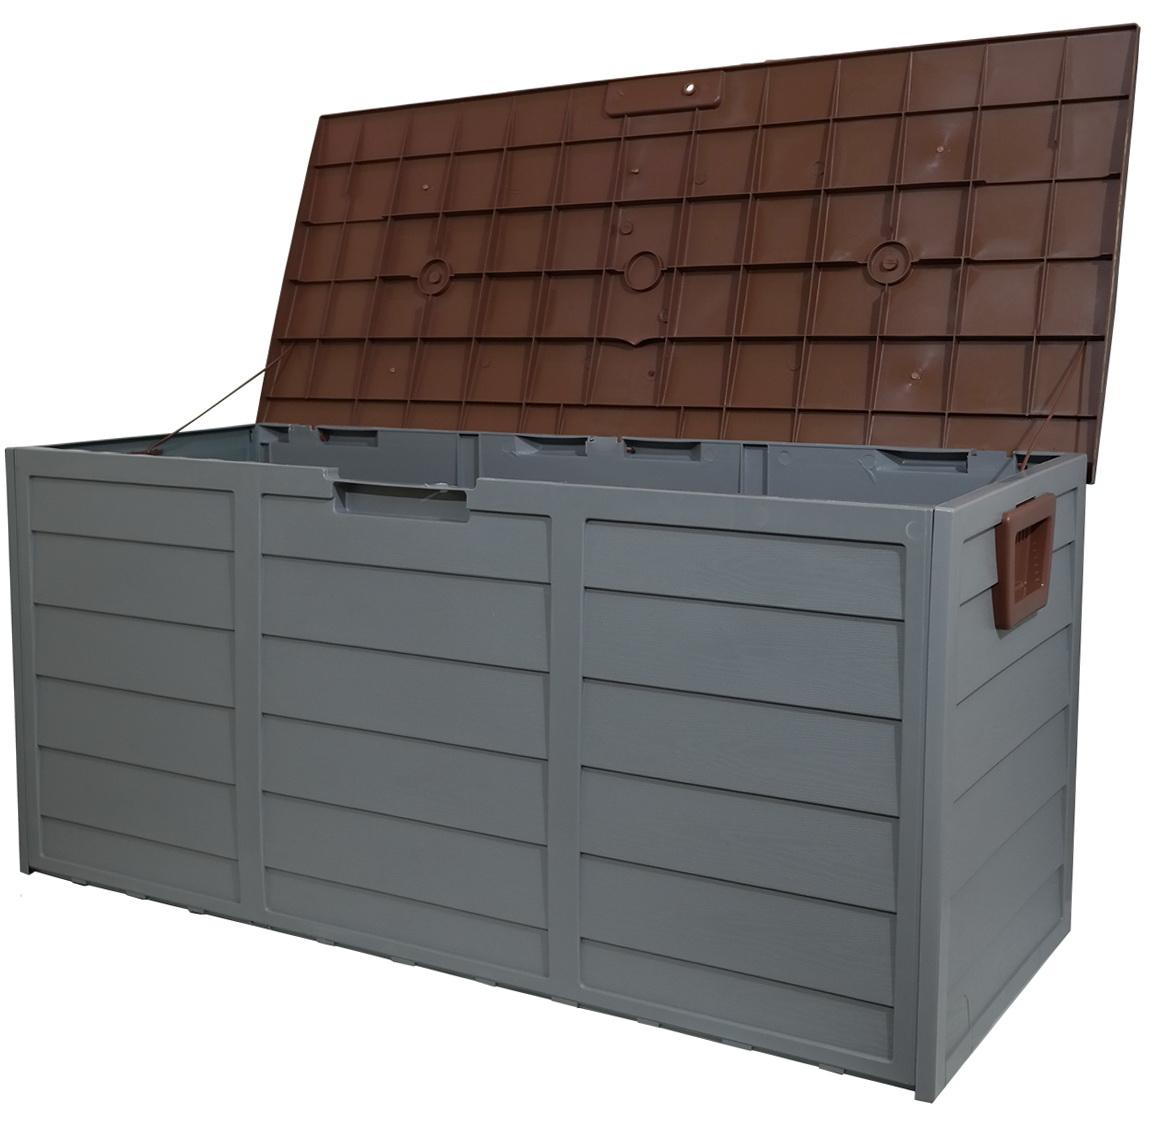 Outdoor Cushion Storage Box Home Depot